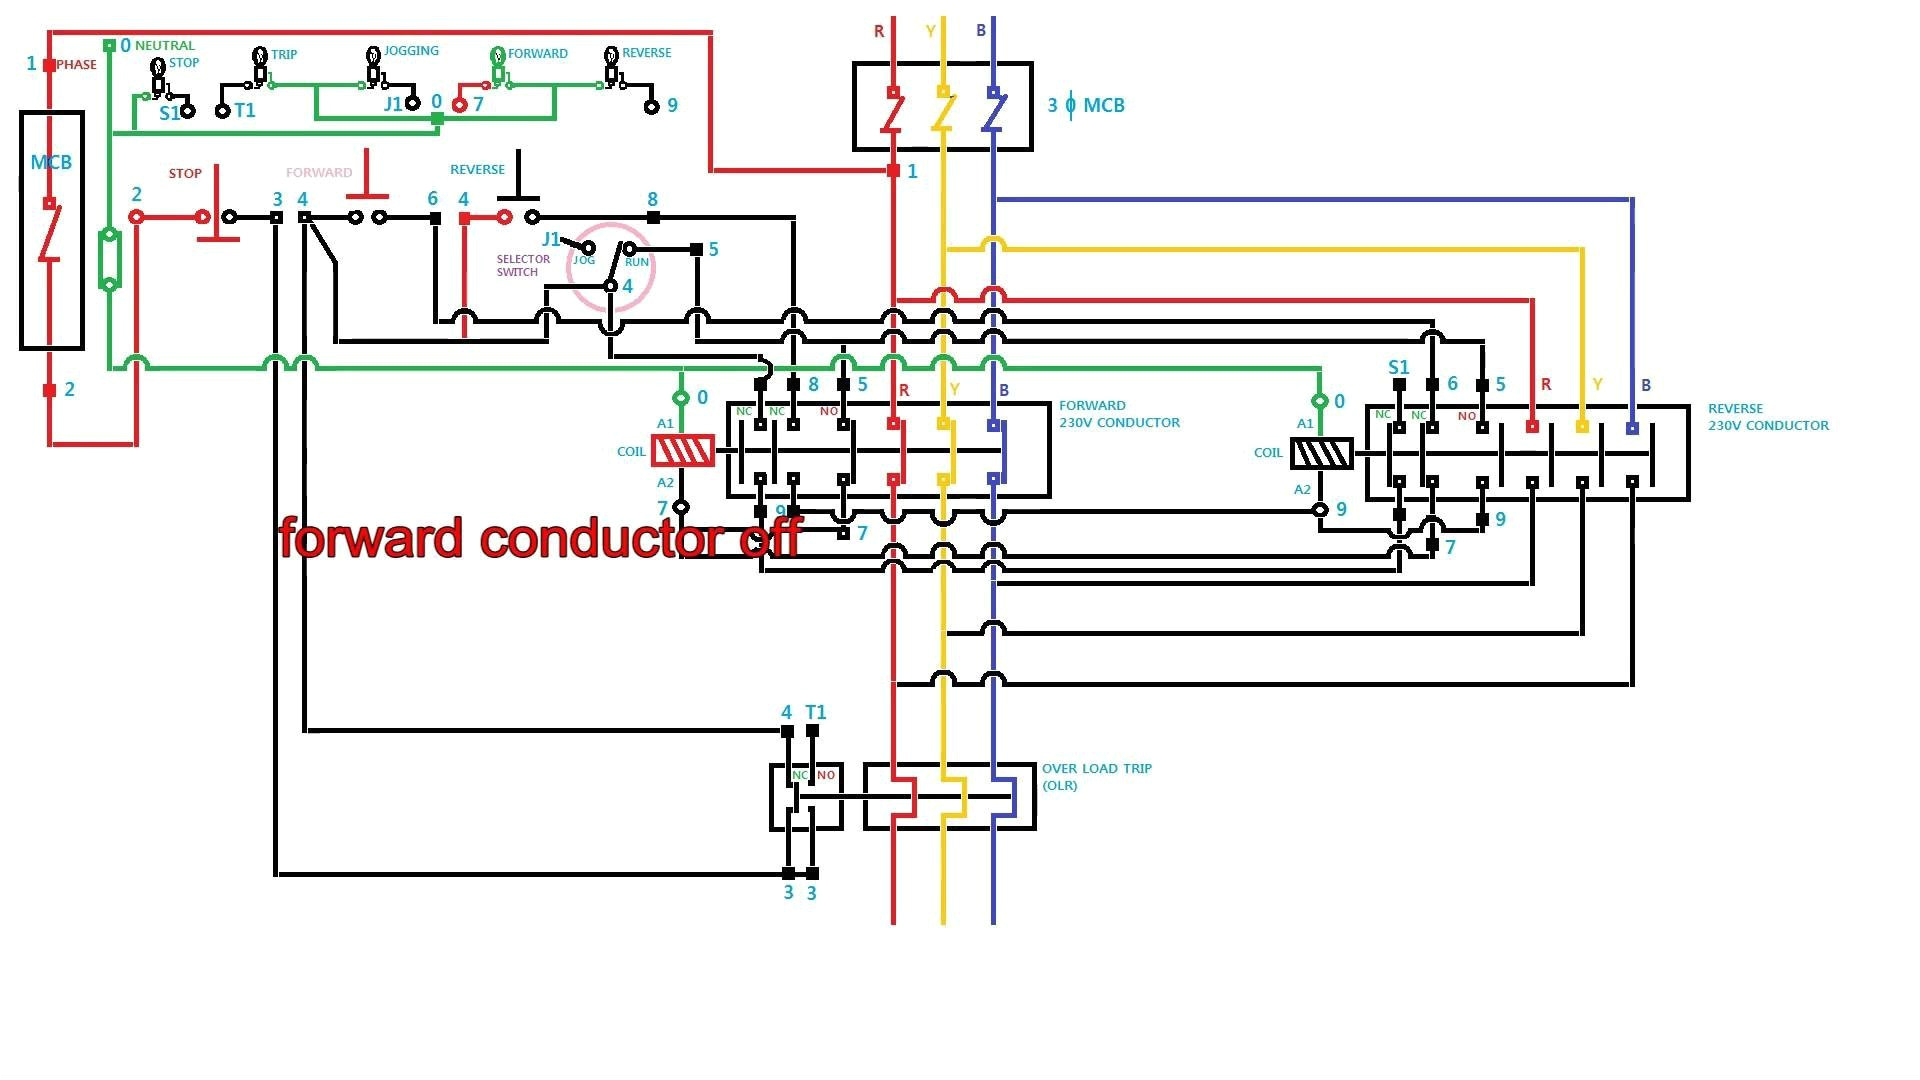 single phase motor wiring diagram forward reverse best of single phase motor forward reverse wiring diagram pdf unique wiring